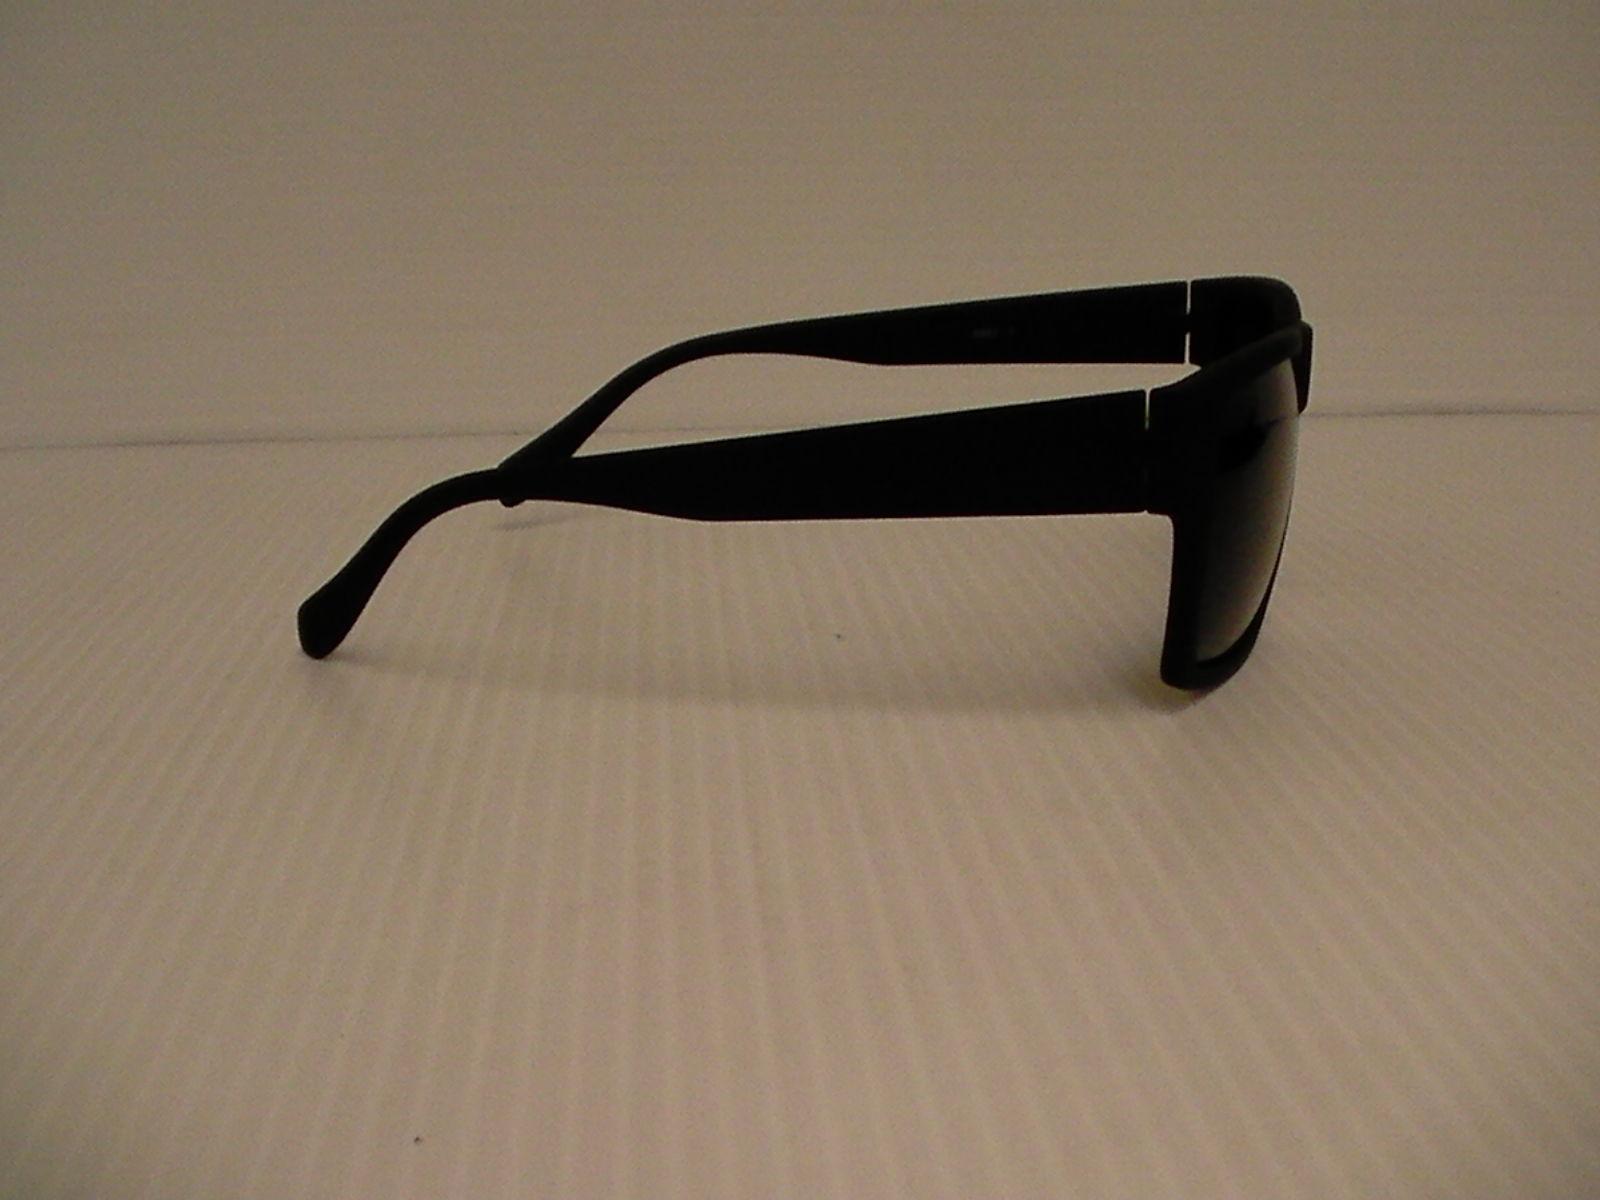 Fashion men's sunglasses square sport matte black frame gray polarized lenses